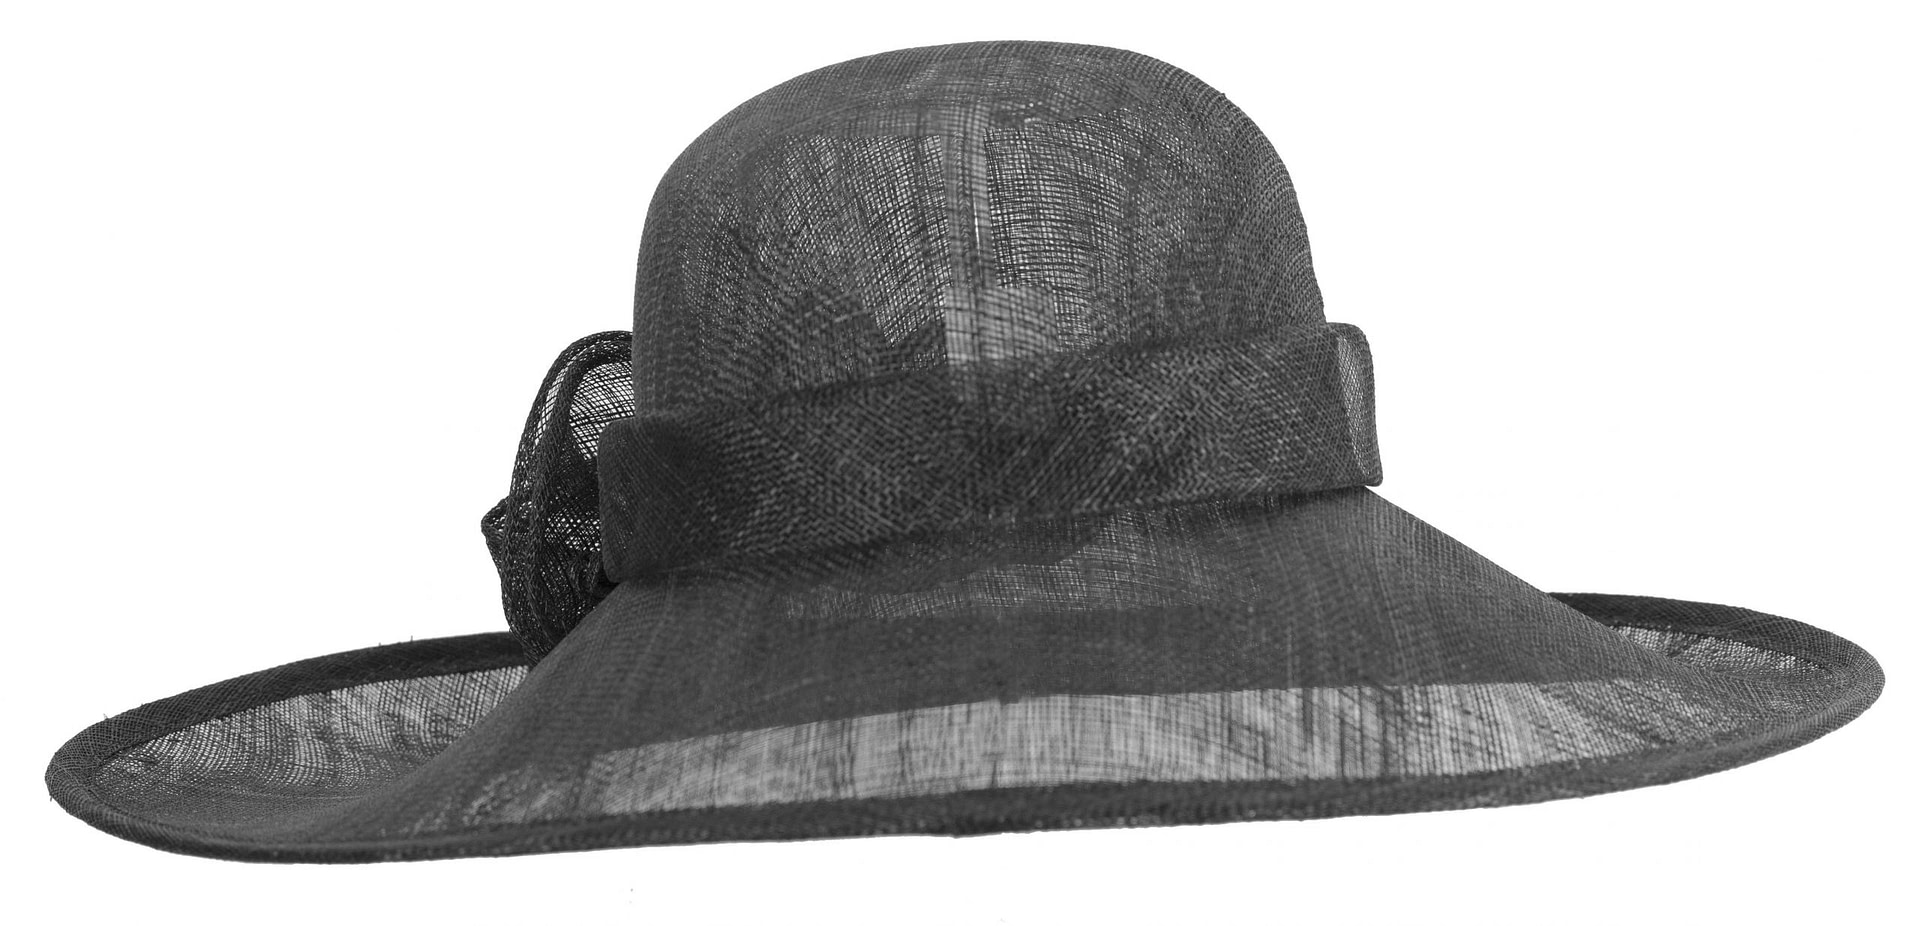 Large black racing hat by Max Alexander